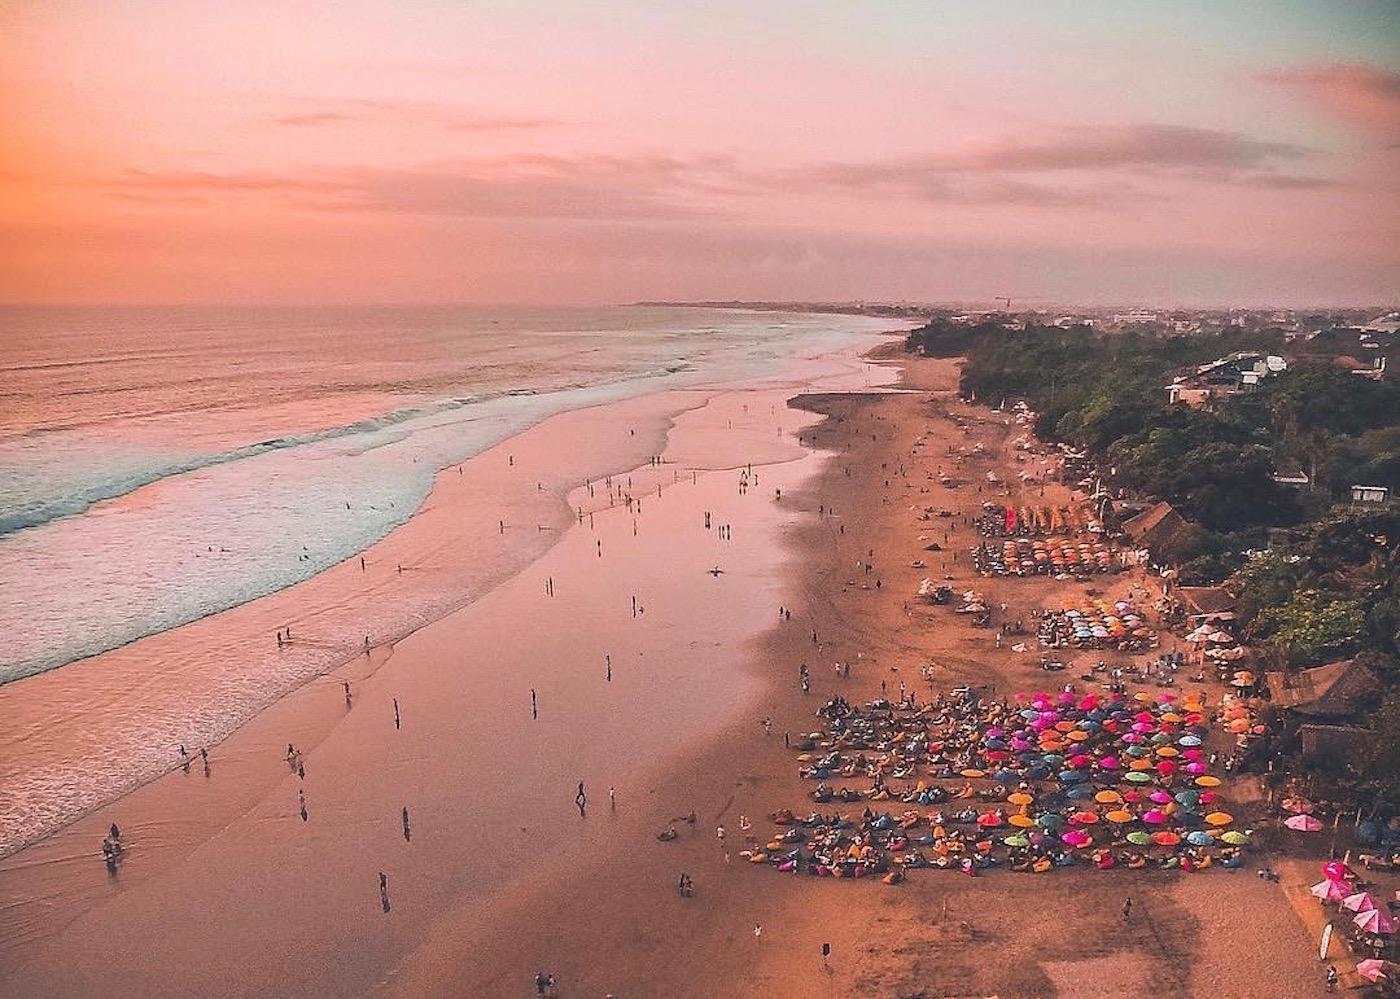 Sunset over Seminyak Beach in Bali, Indonesia